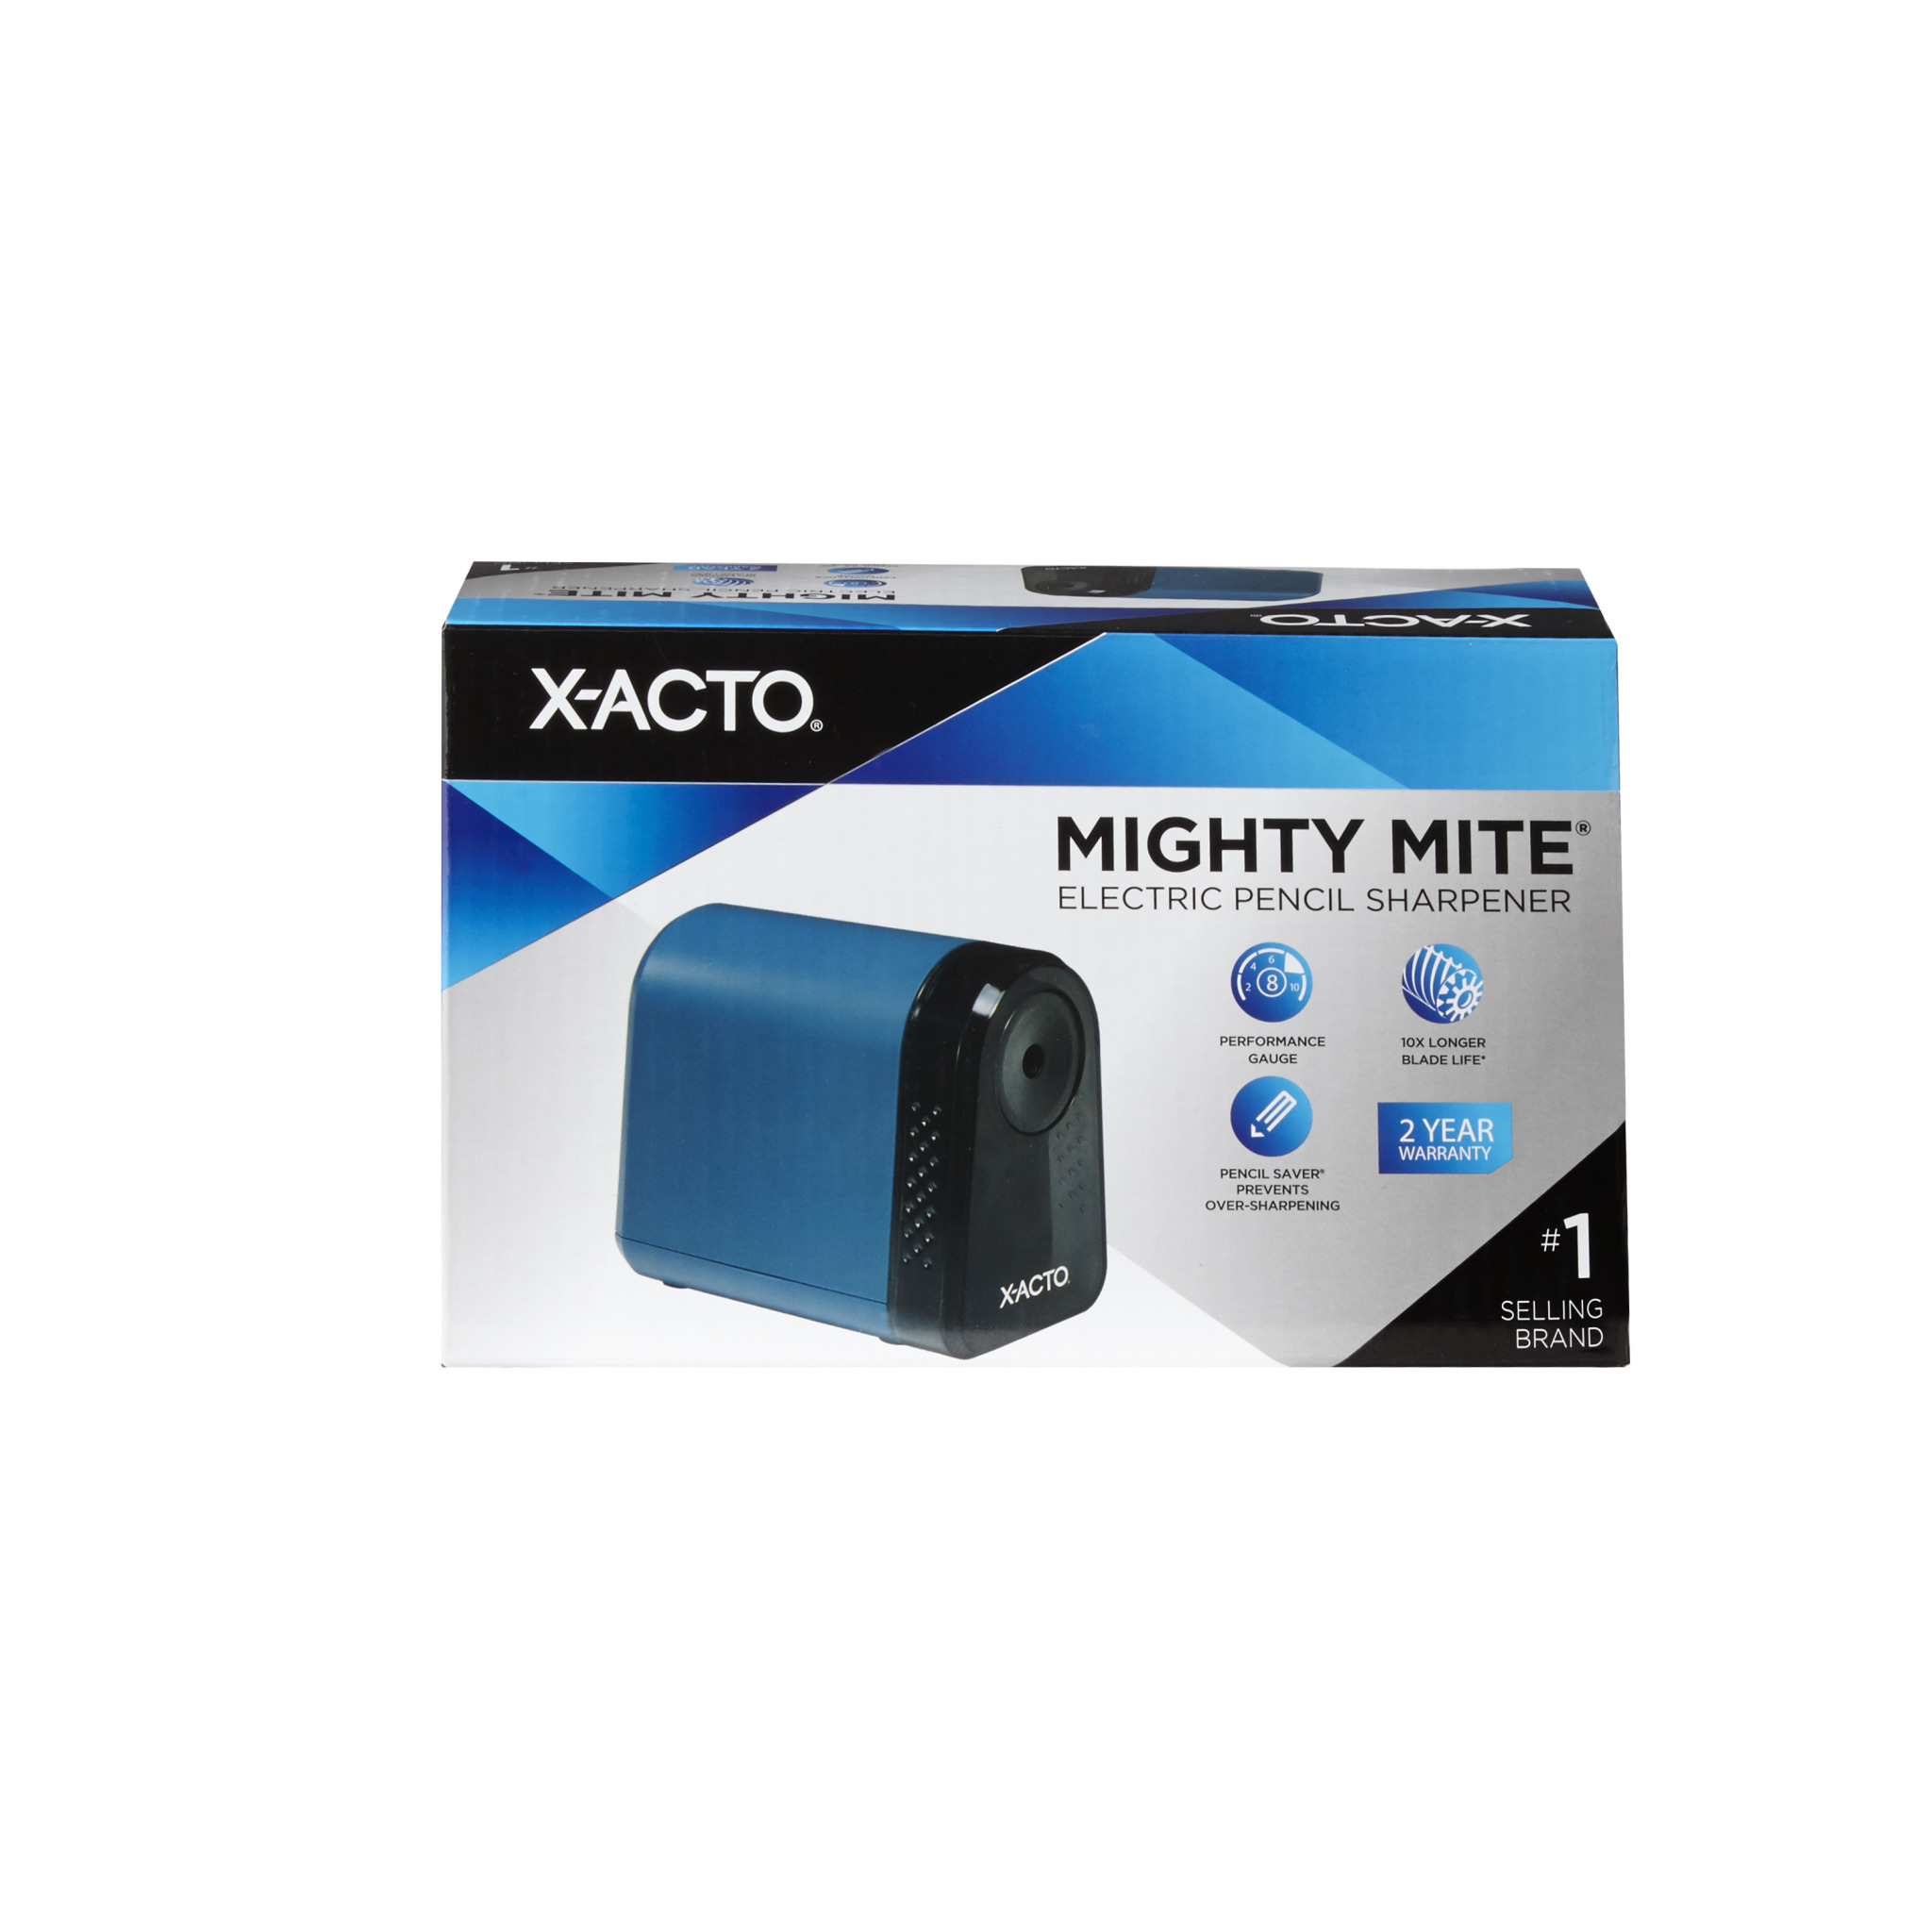 X-ACTO Mighty Mite Desktop Electric Pencil Sharpener, Mineral Green